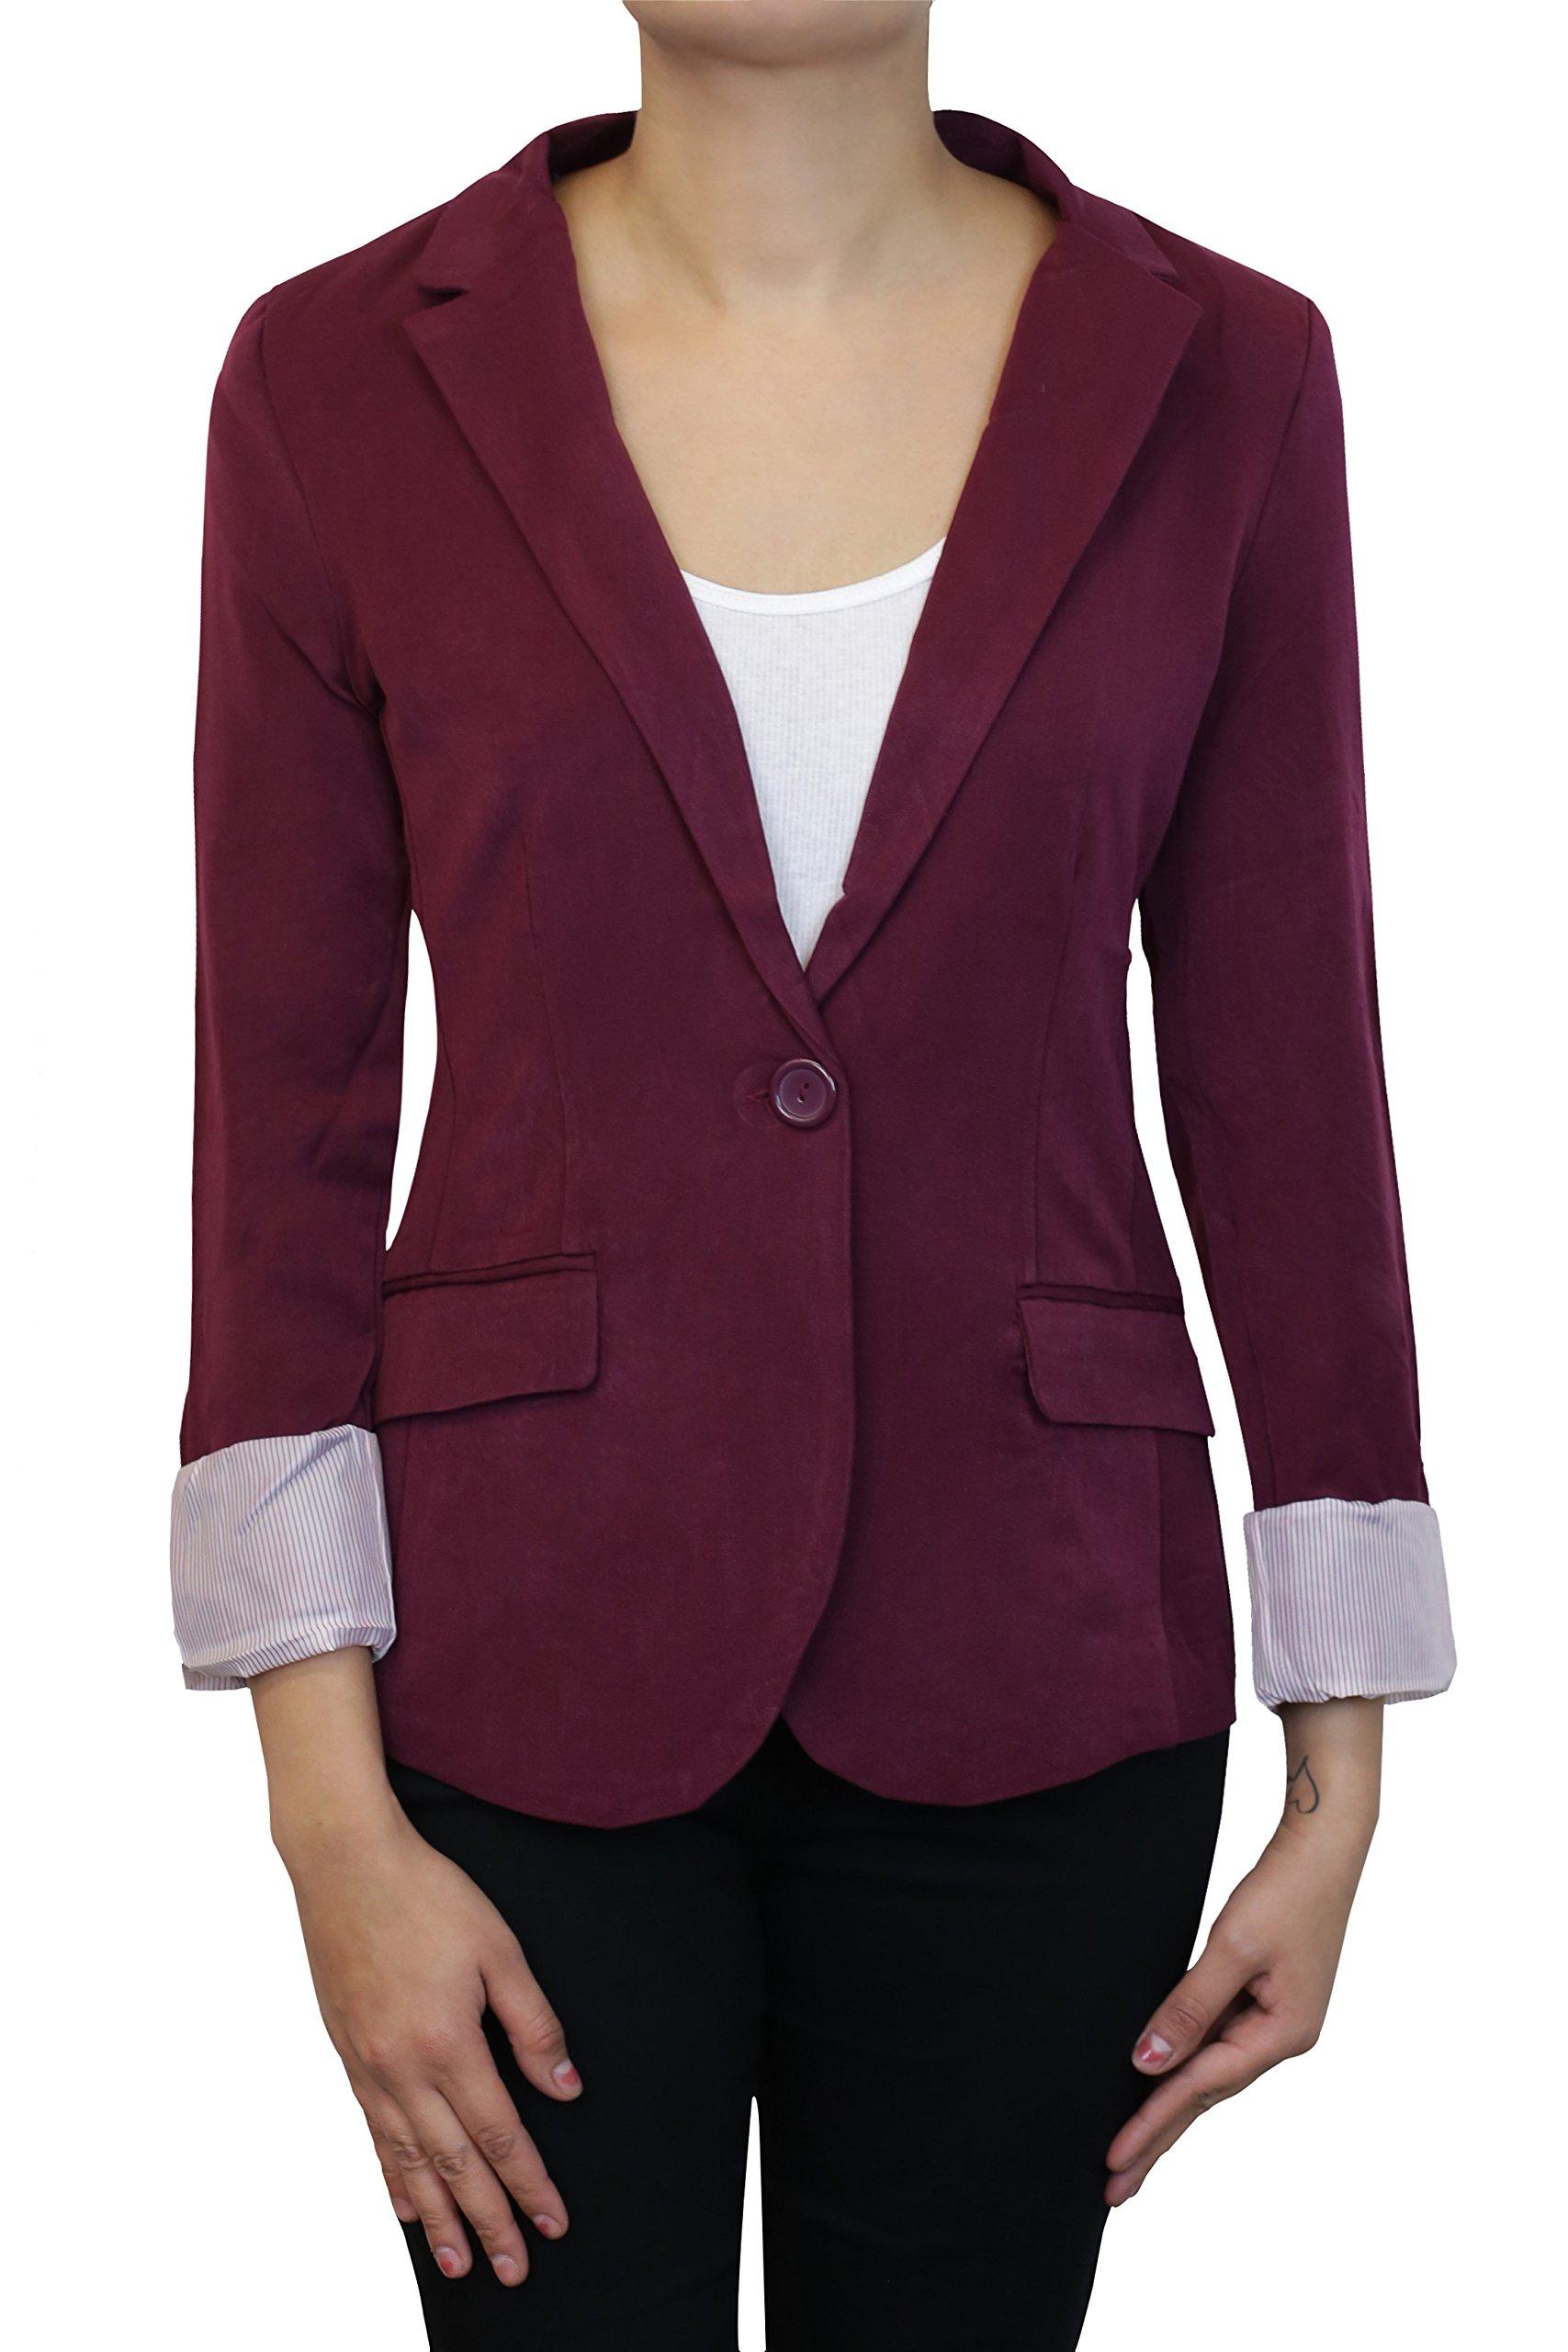 Instar Mode Women's Versatile Business Attire Blazers in Varies Styles (B22117 Burgundy, Medium)